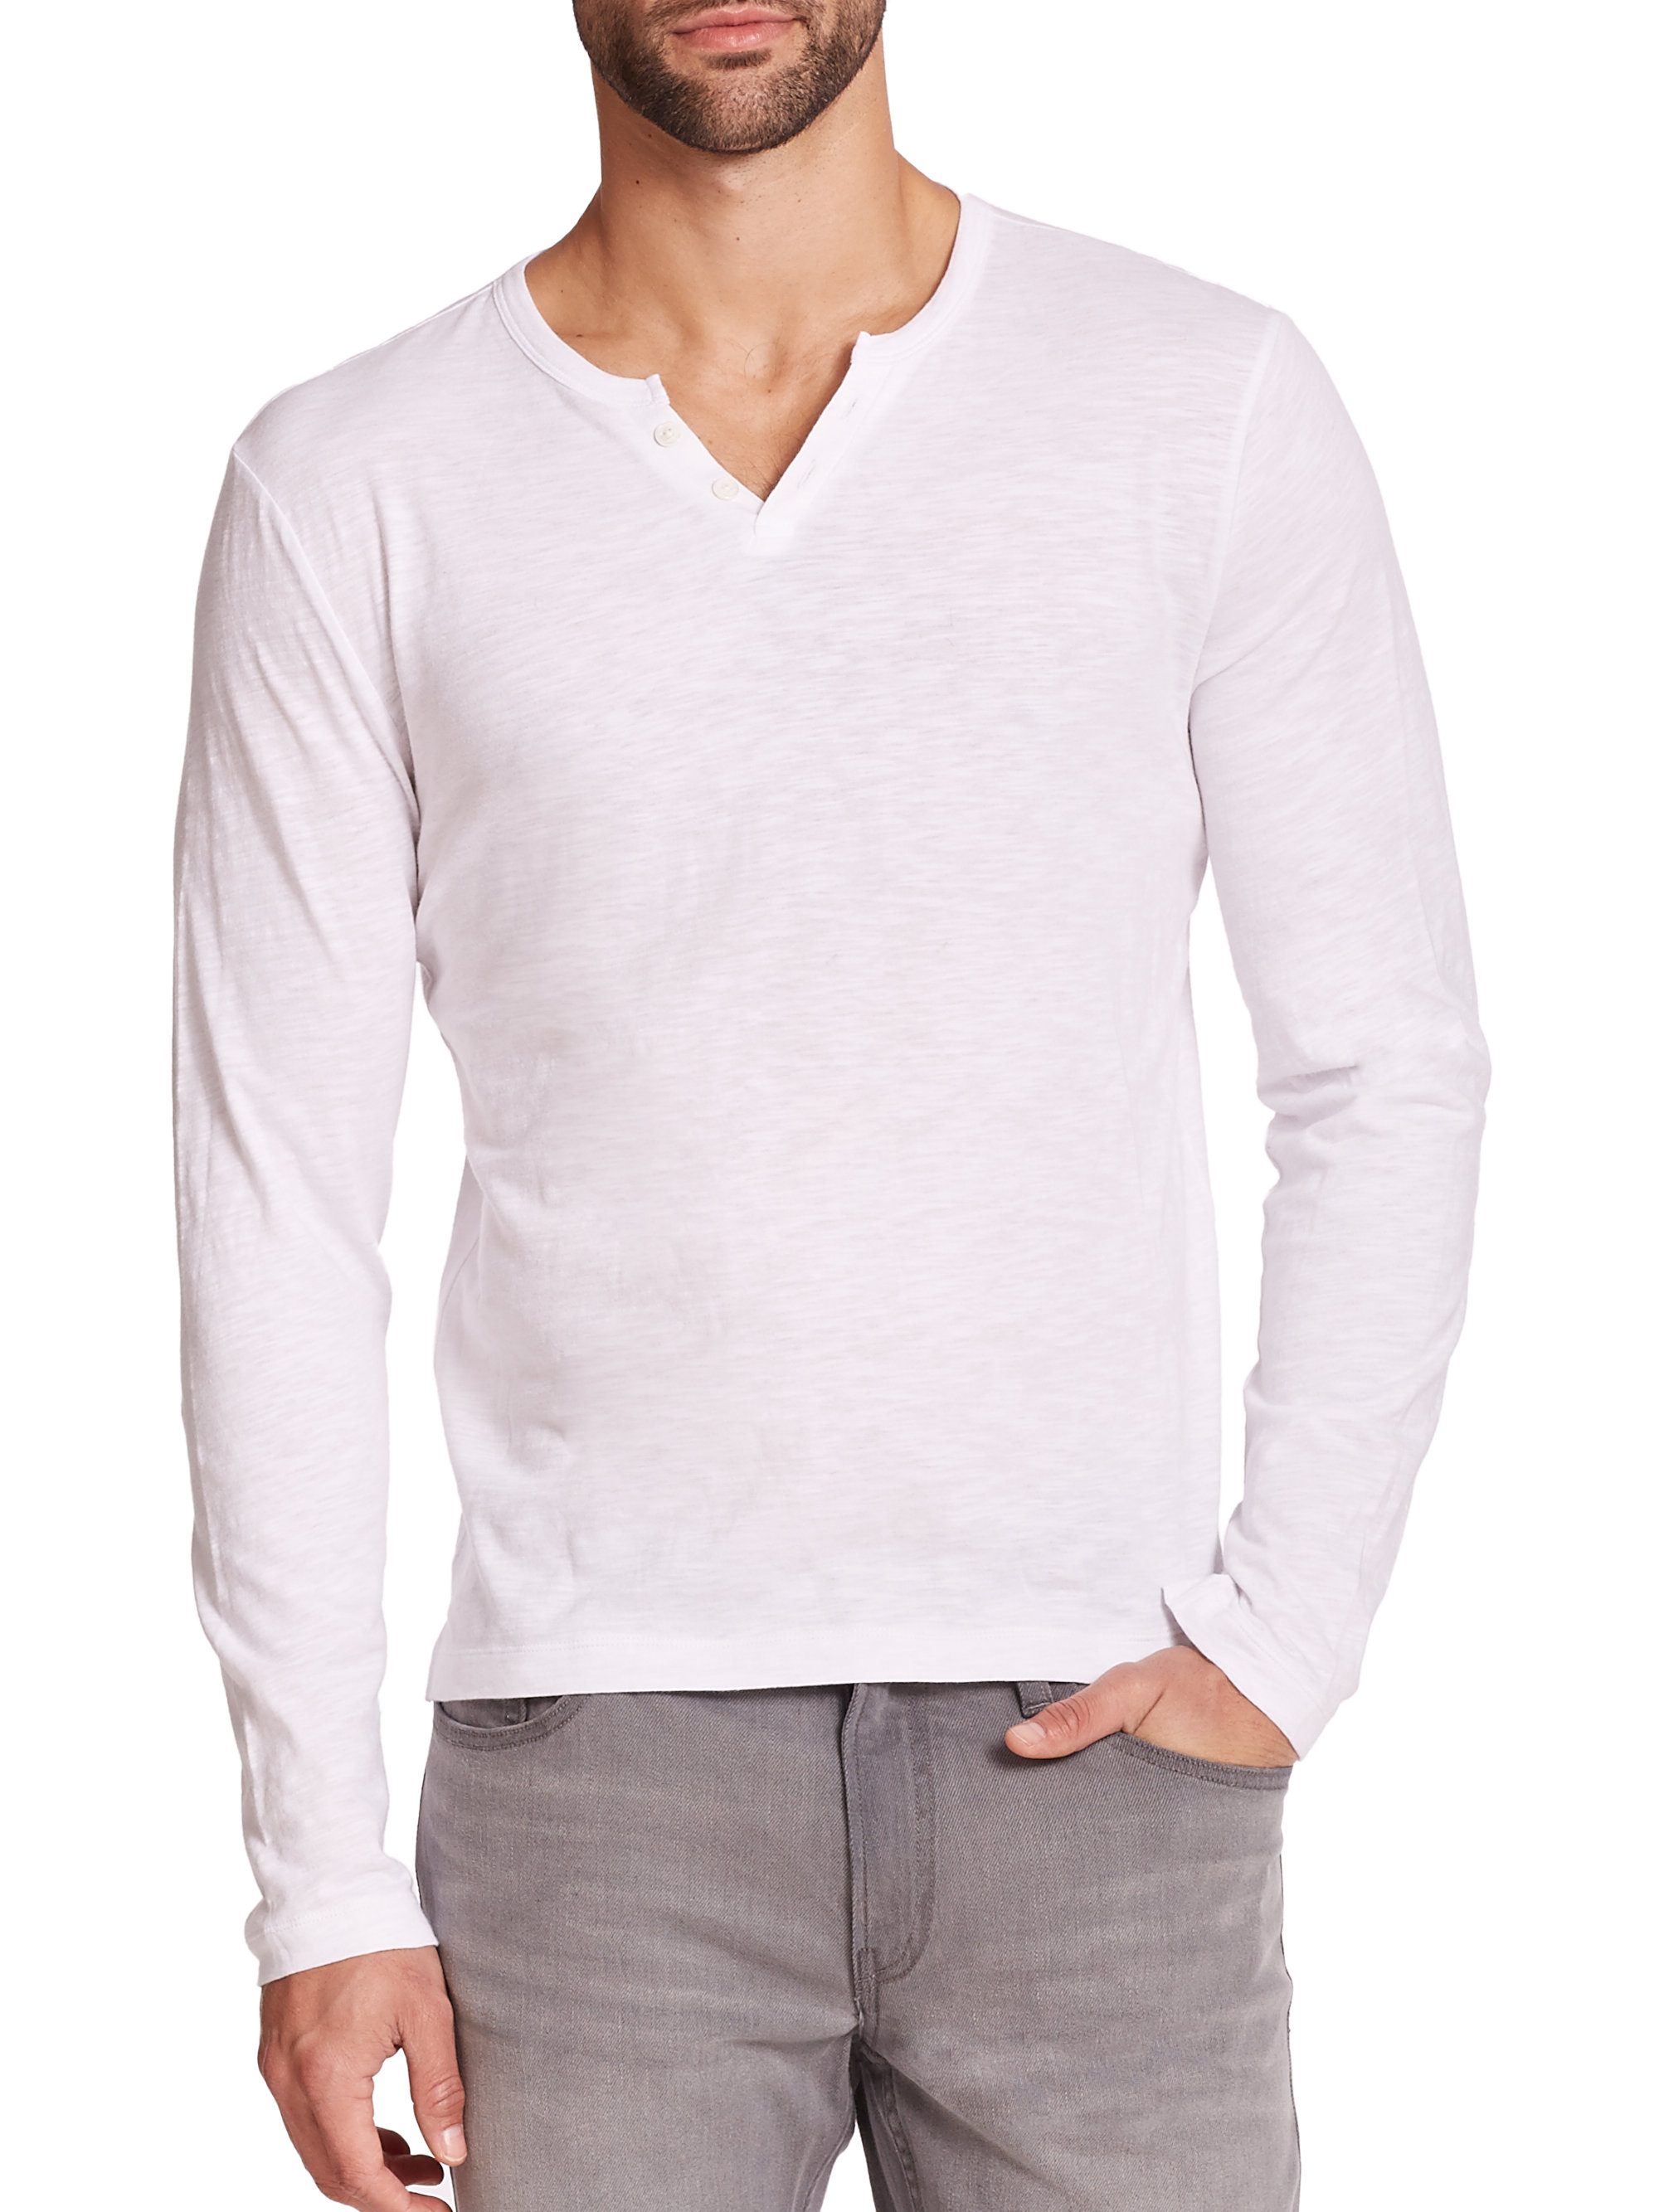 michael kors cotton jersey t shirt in white for men lyst. Black Bedroom Furniture Sets. Home Design Ideas